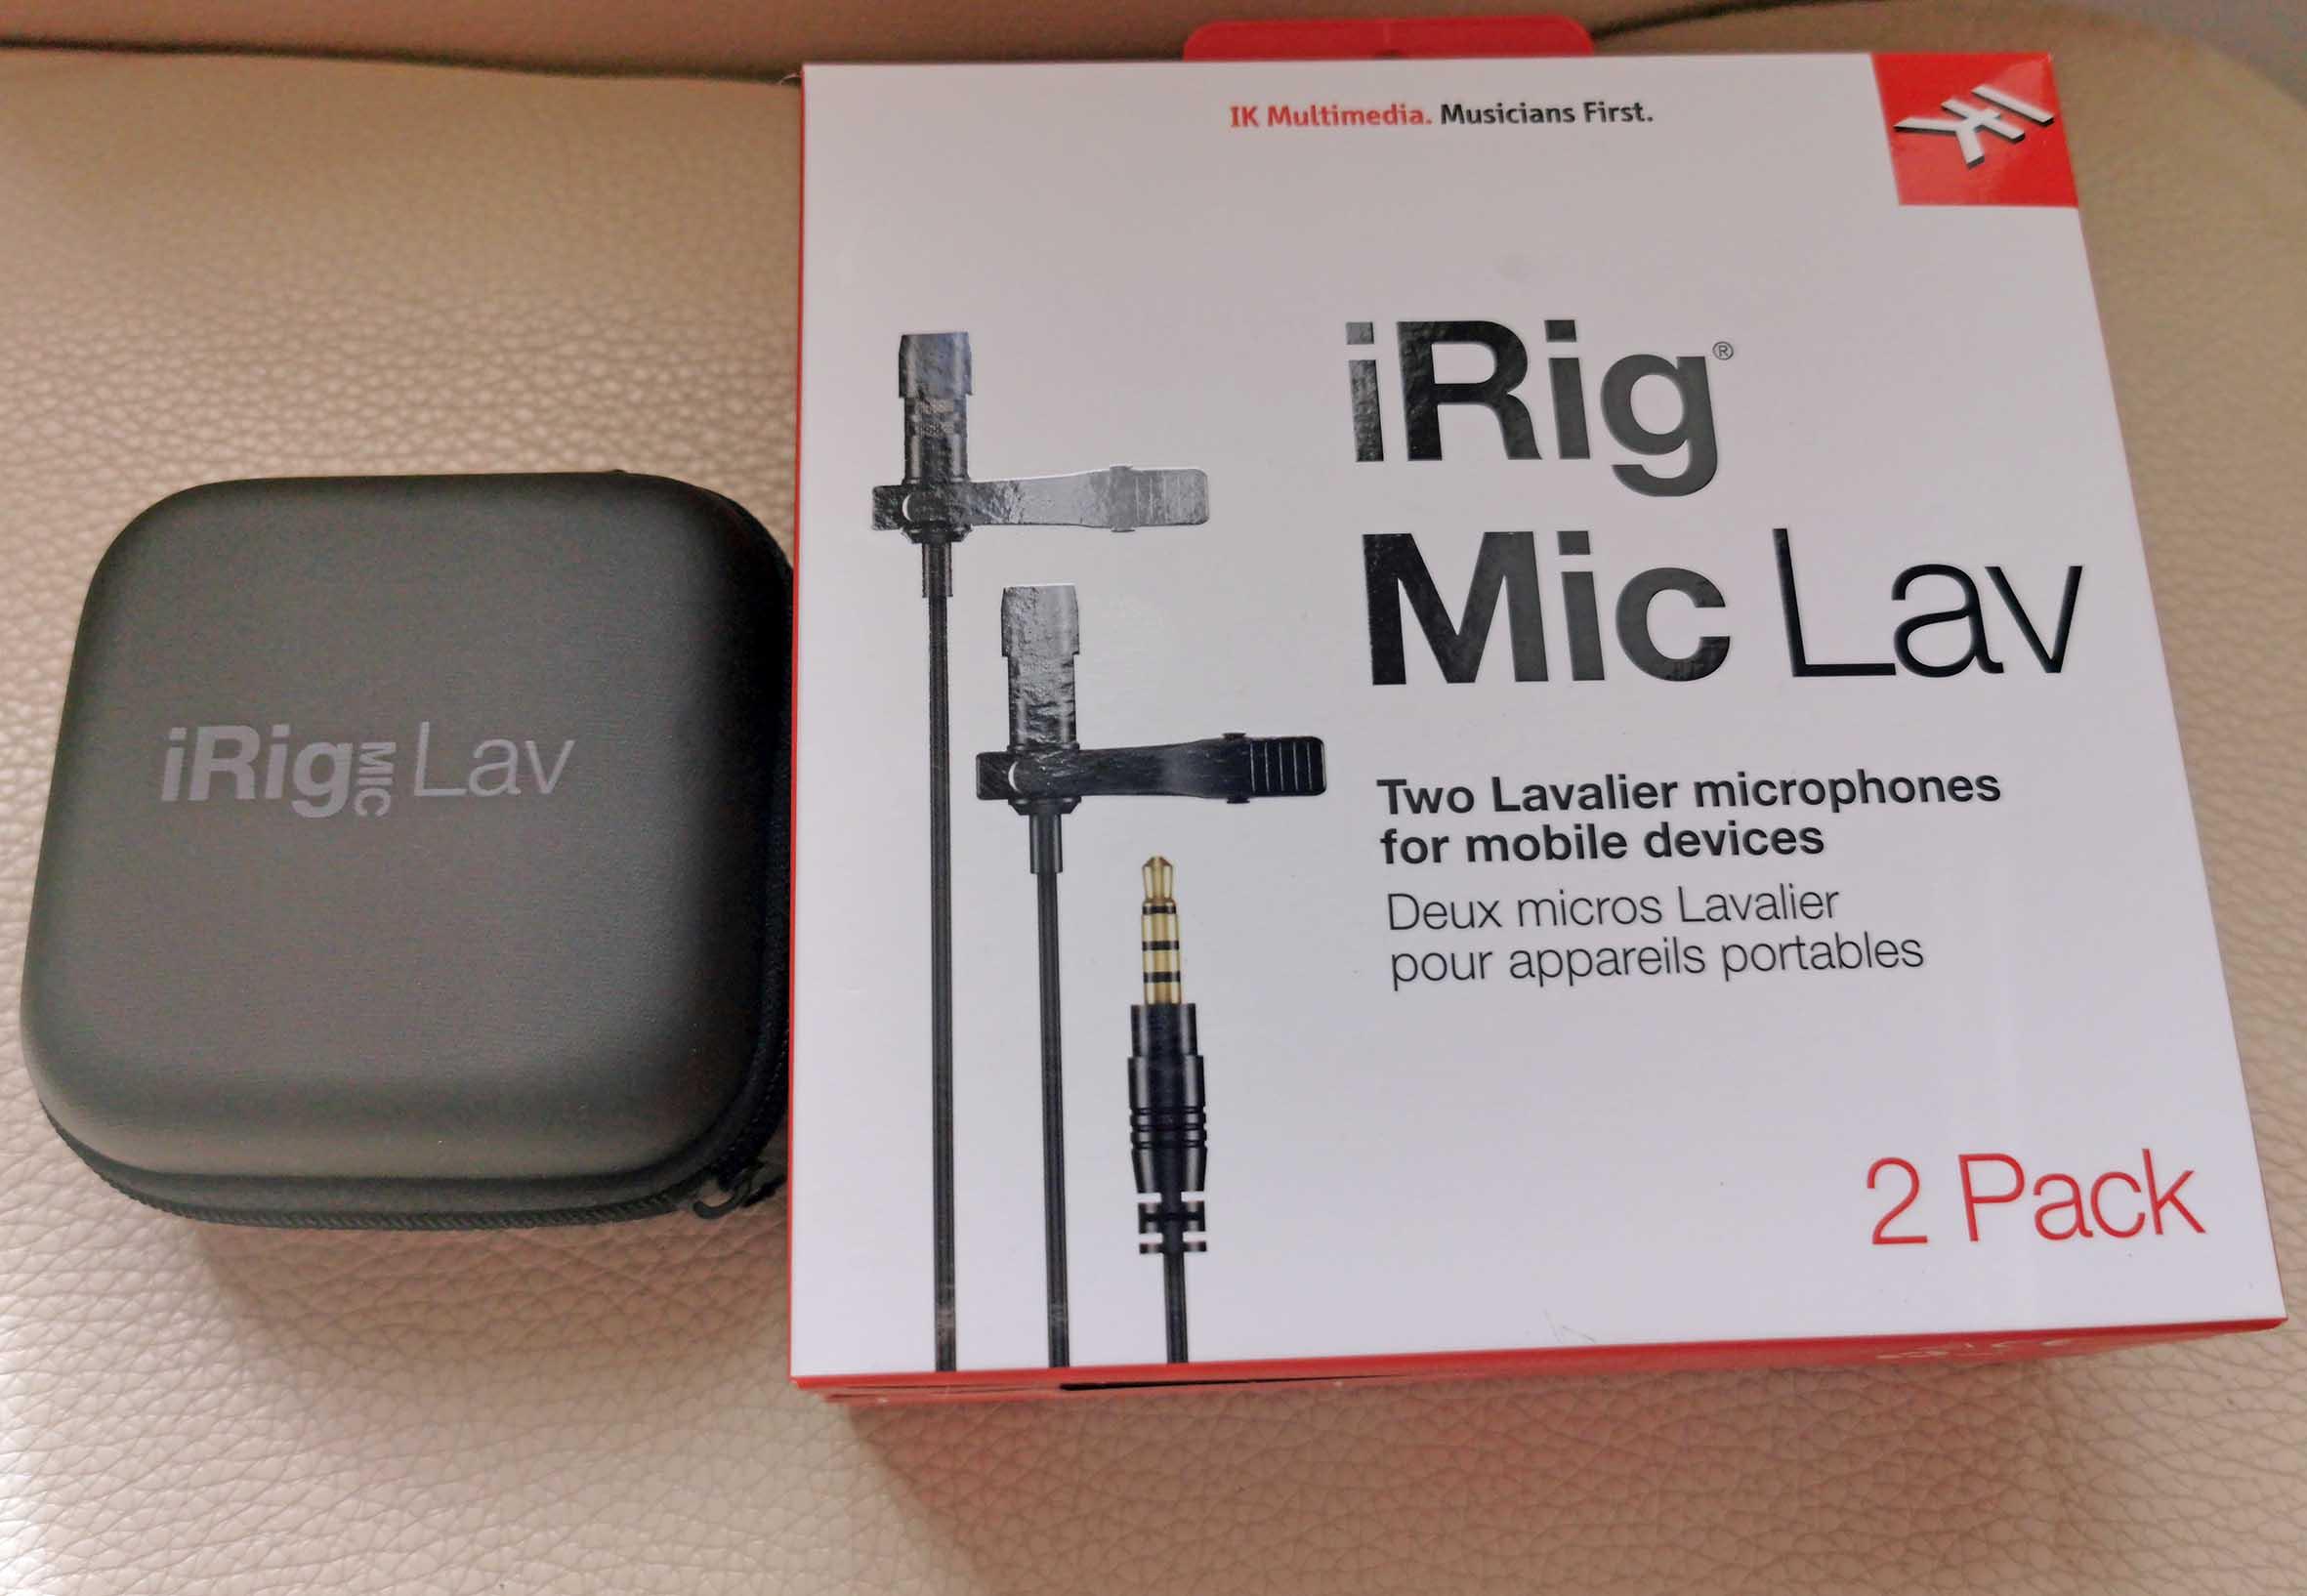 iRig Mic Lav IK Multimedia